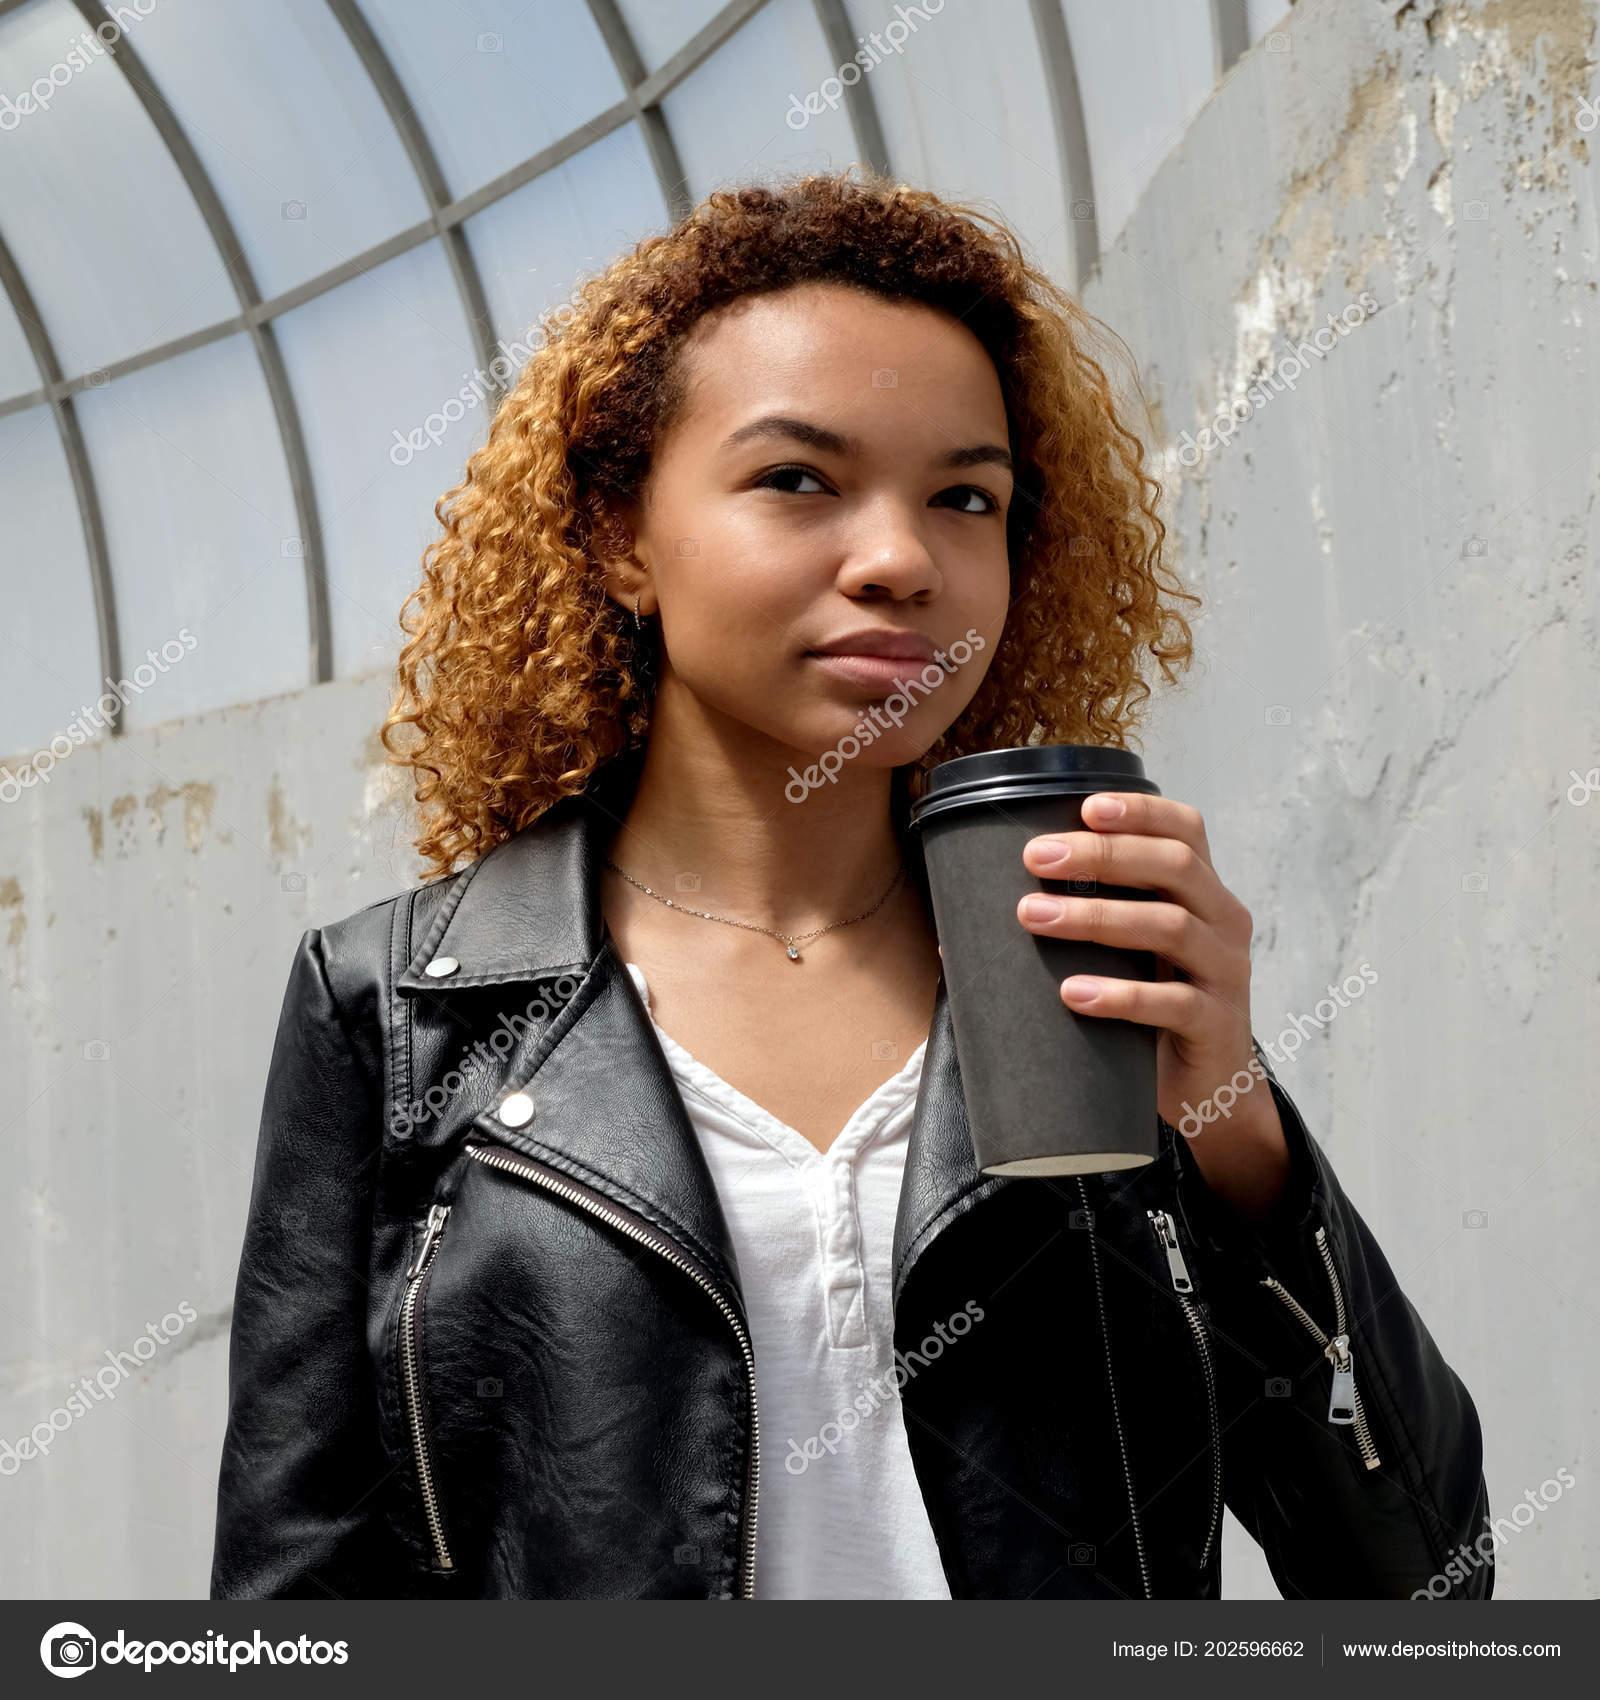 d44a6b8ee Dark Skinned Teenager Girl Looks Thoughtfully Away Beautiful Modern ...